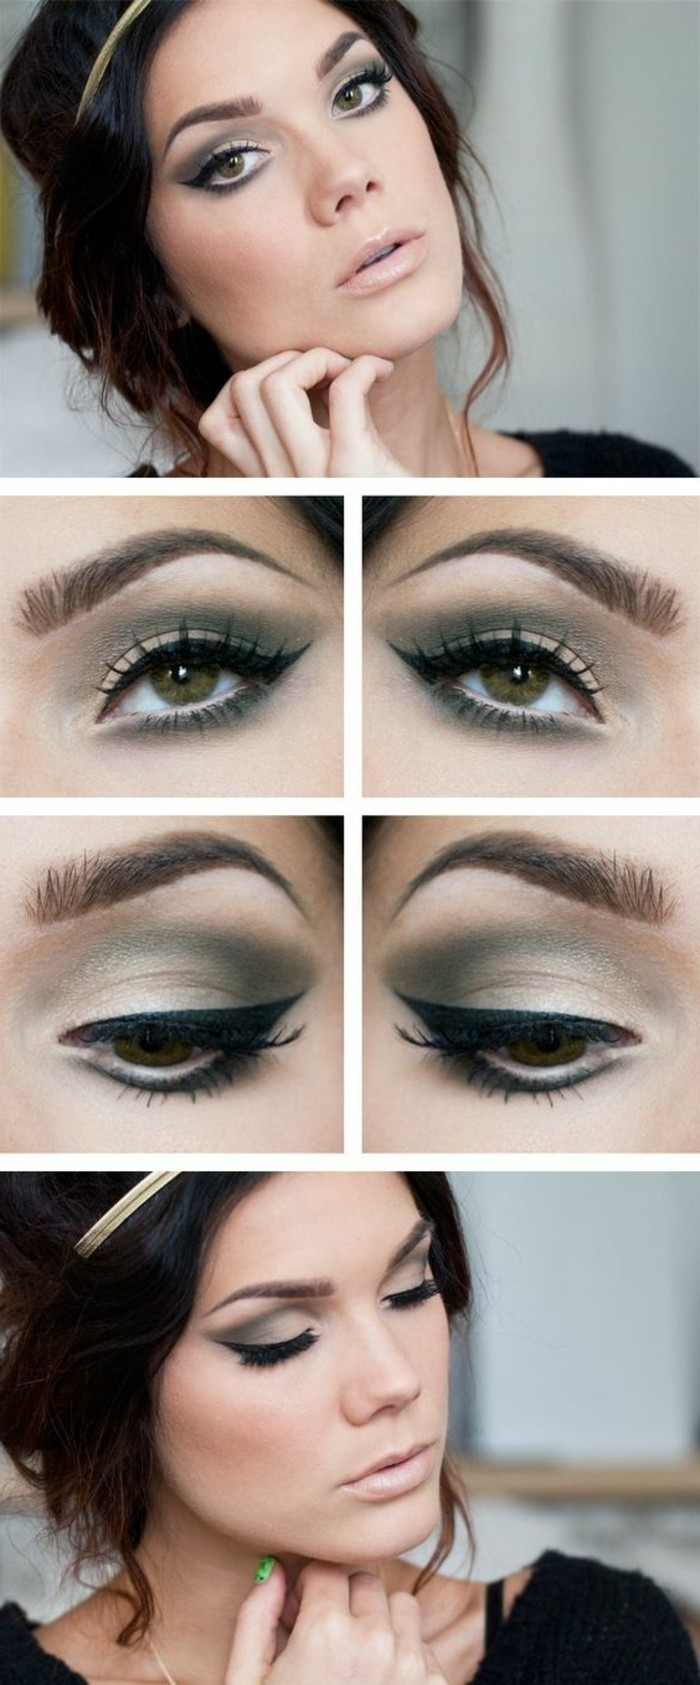 maquillage-yeux-marron-vert-idee-tuto-maquillage-coiffure-cheveux-marrons